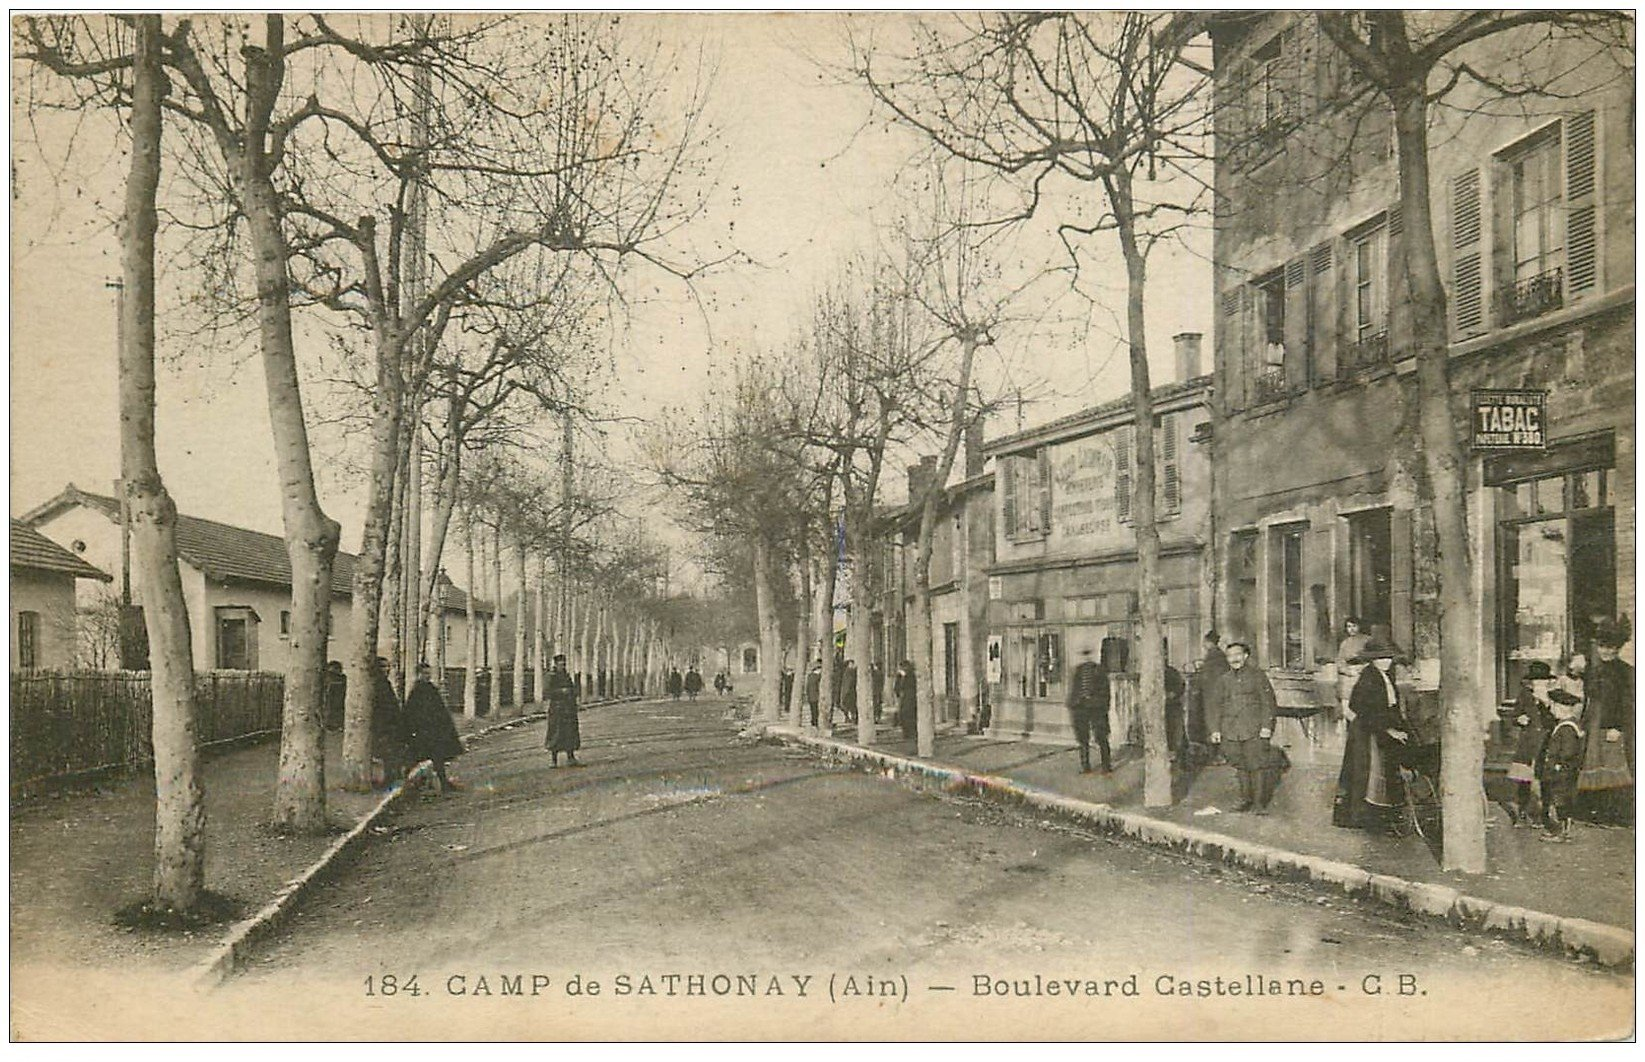 carte postale ancienne 01 Col de Sathonay. Boulevard Castellane 1916. Tabac Bazar Lyonnais